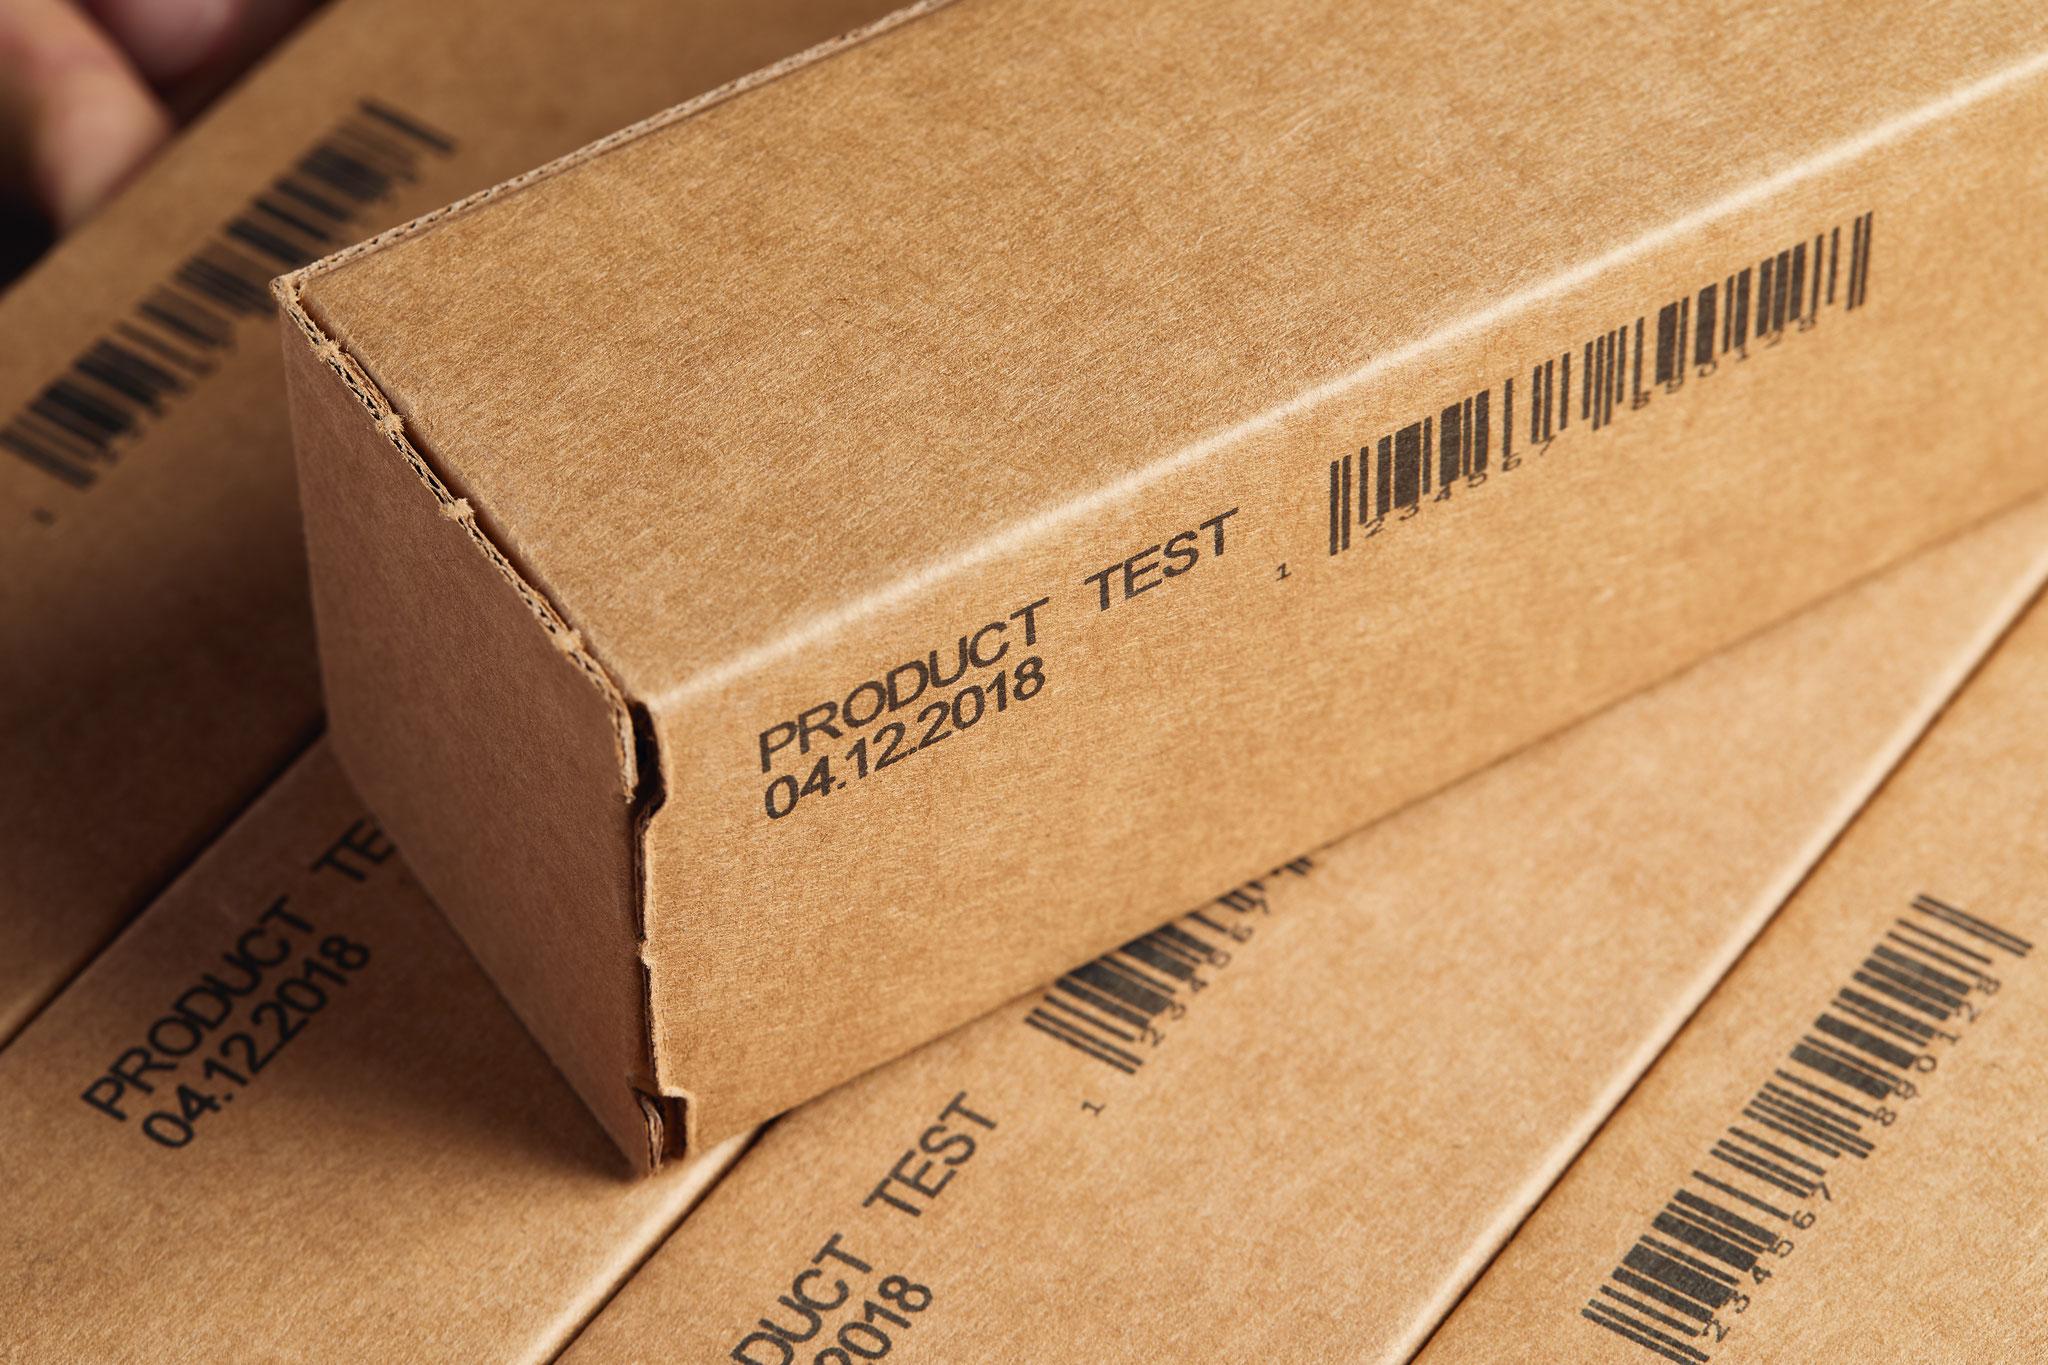 Verpackung - Edding Portable 12